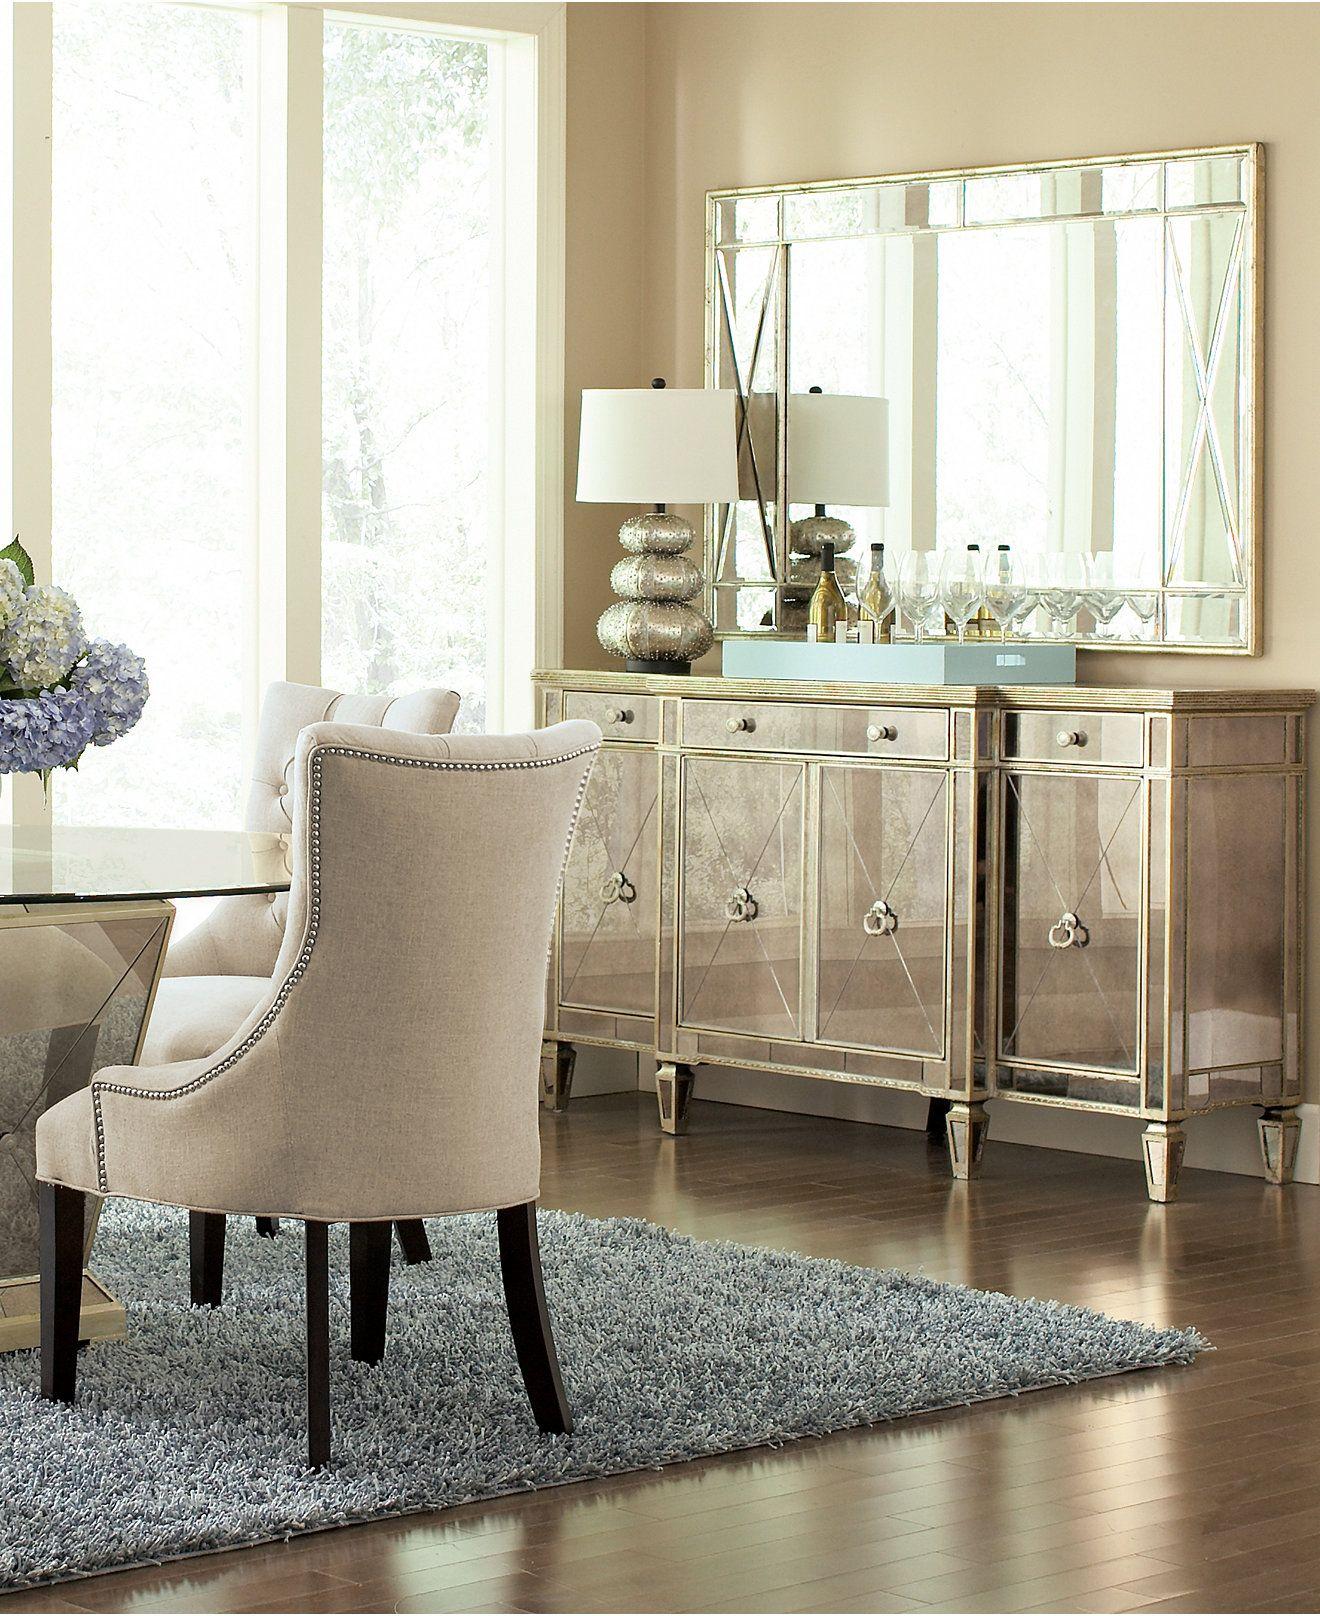 marais mirrored credenza sideboard furniture mirrored